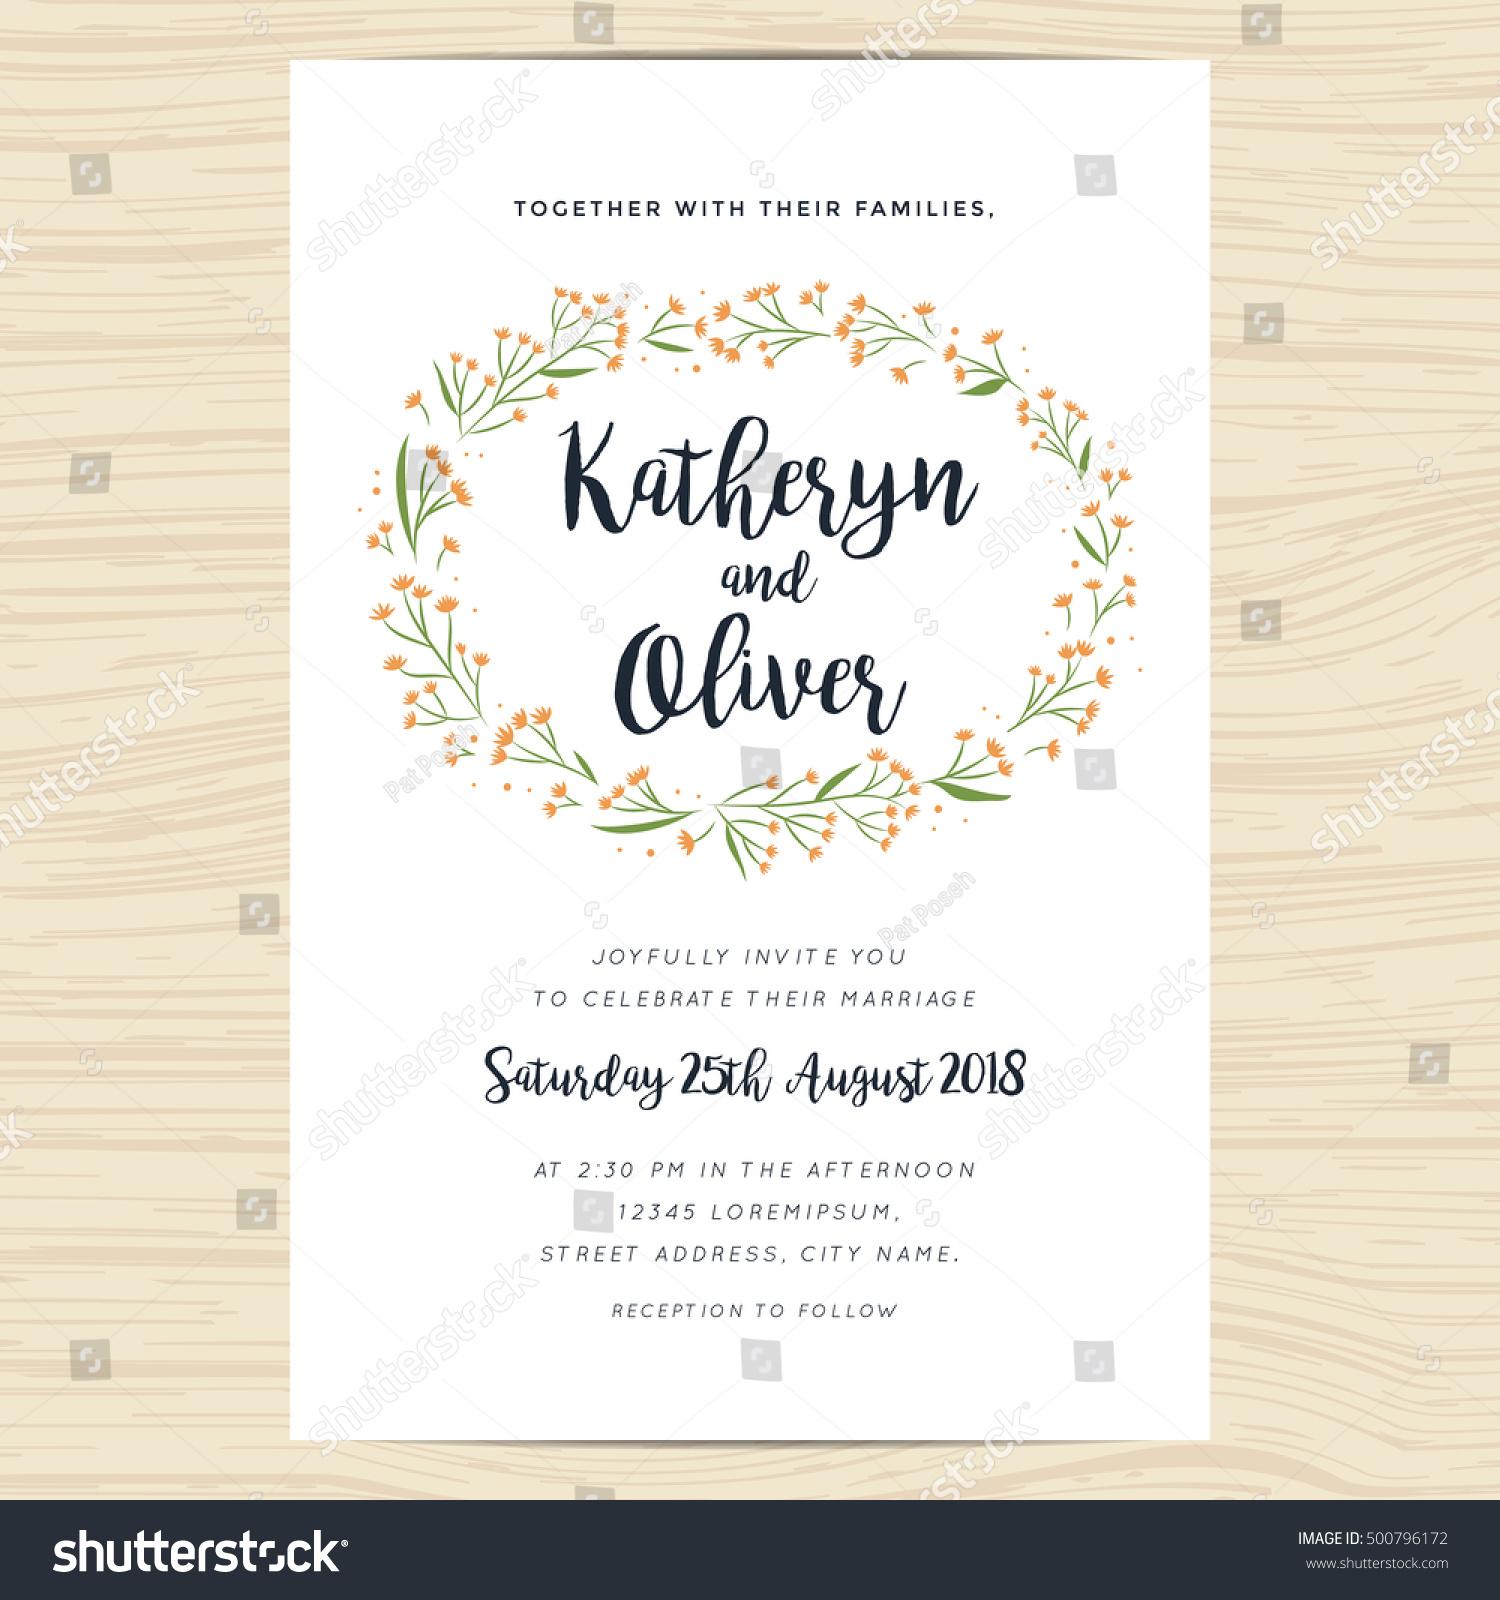 Wedding Invitation Card Template Decorate Hand Stock Vector ...